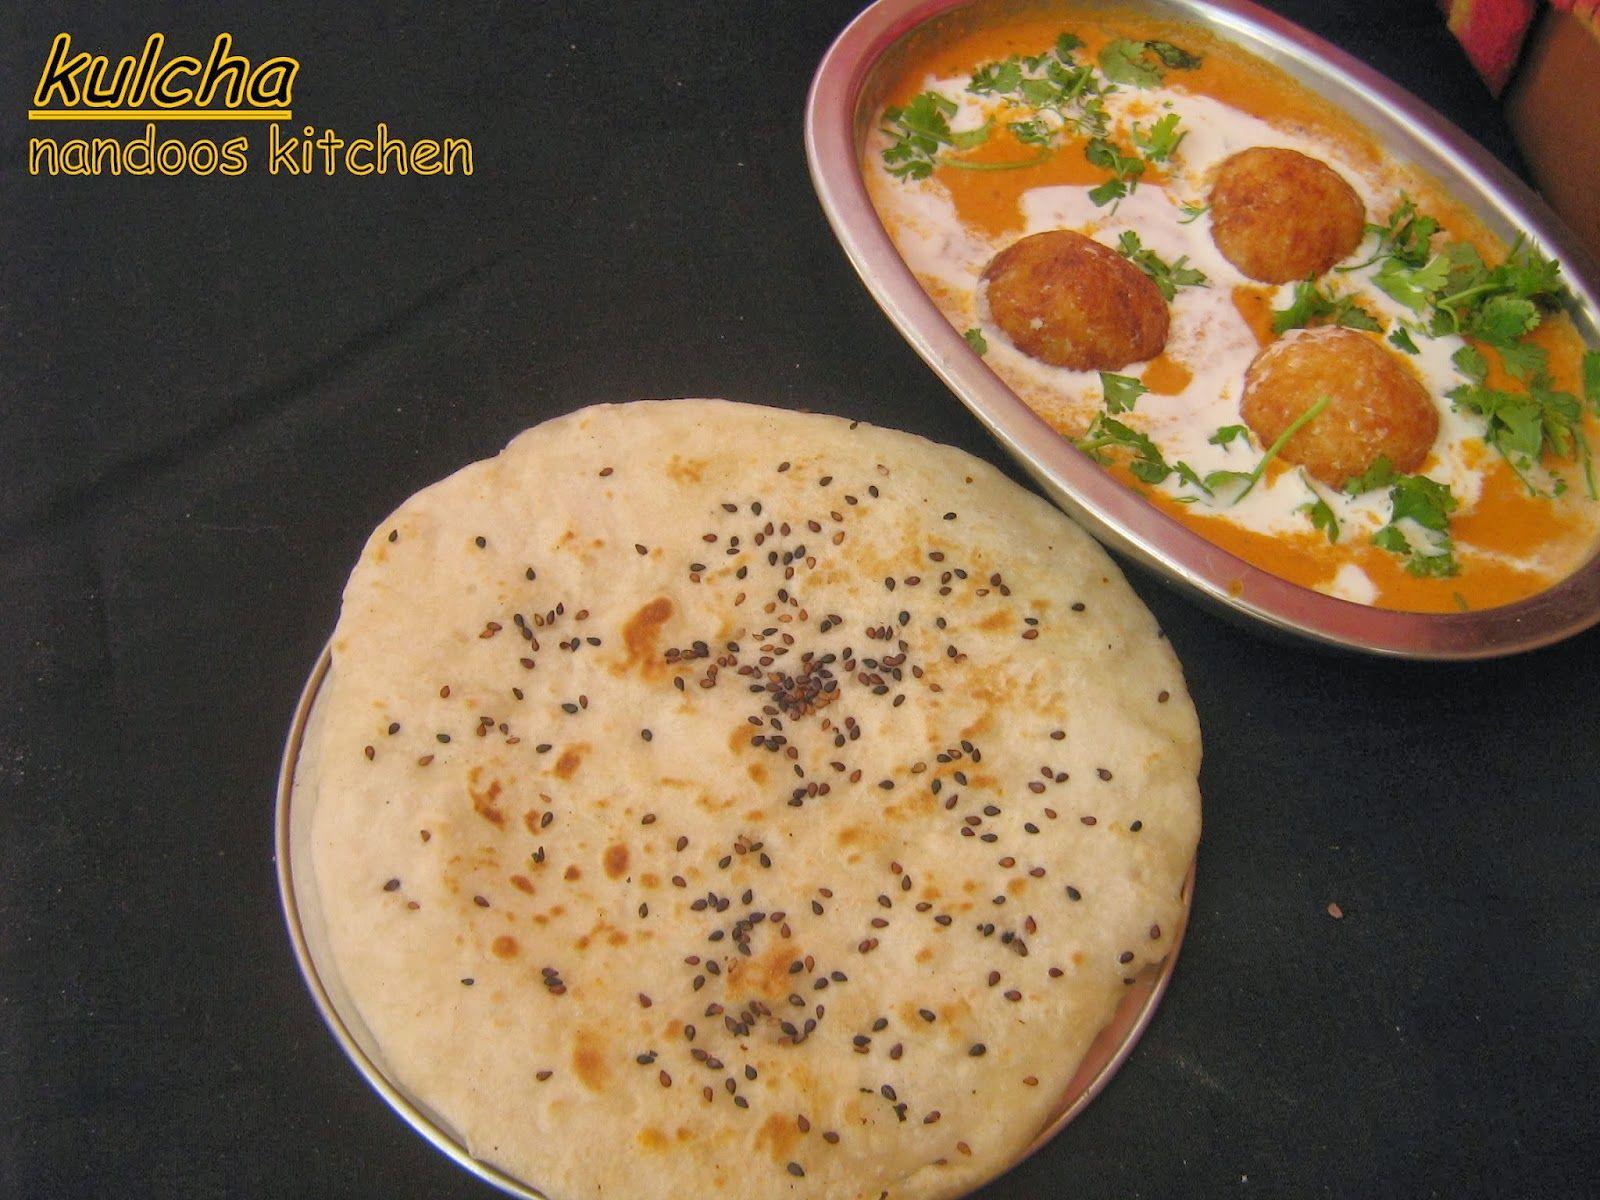 Kulcha indian flat bread with maida flour indian food kulcha indian flat bread with maida flour forumfinder Choice Image